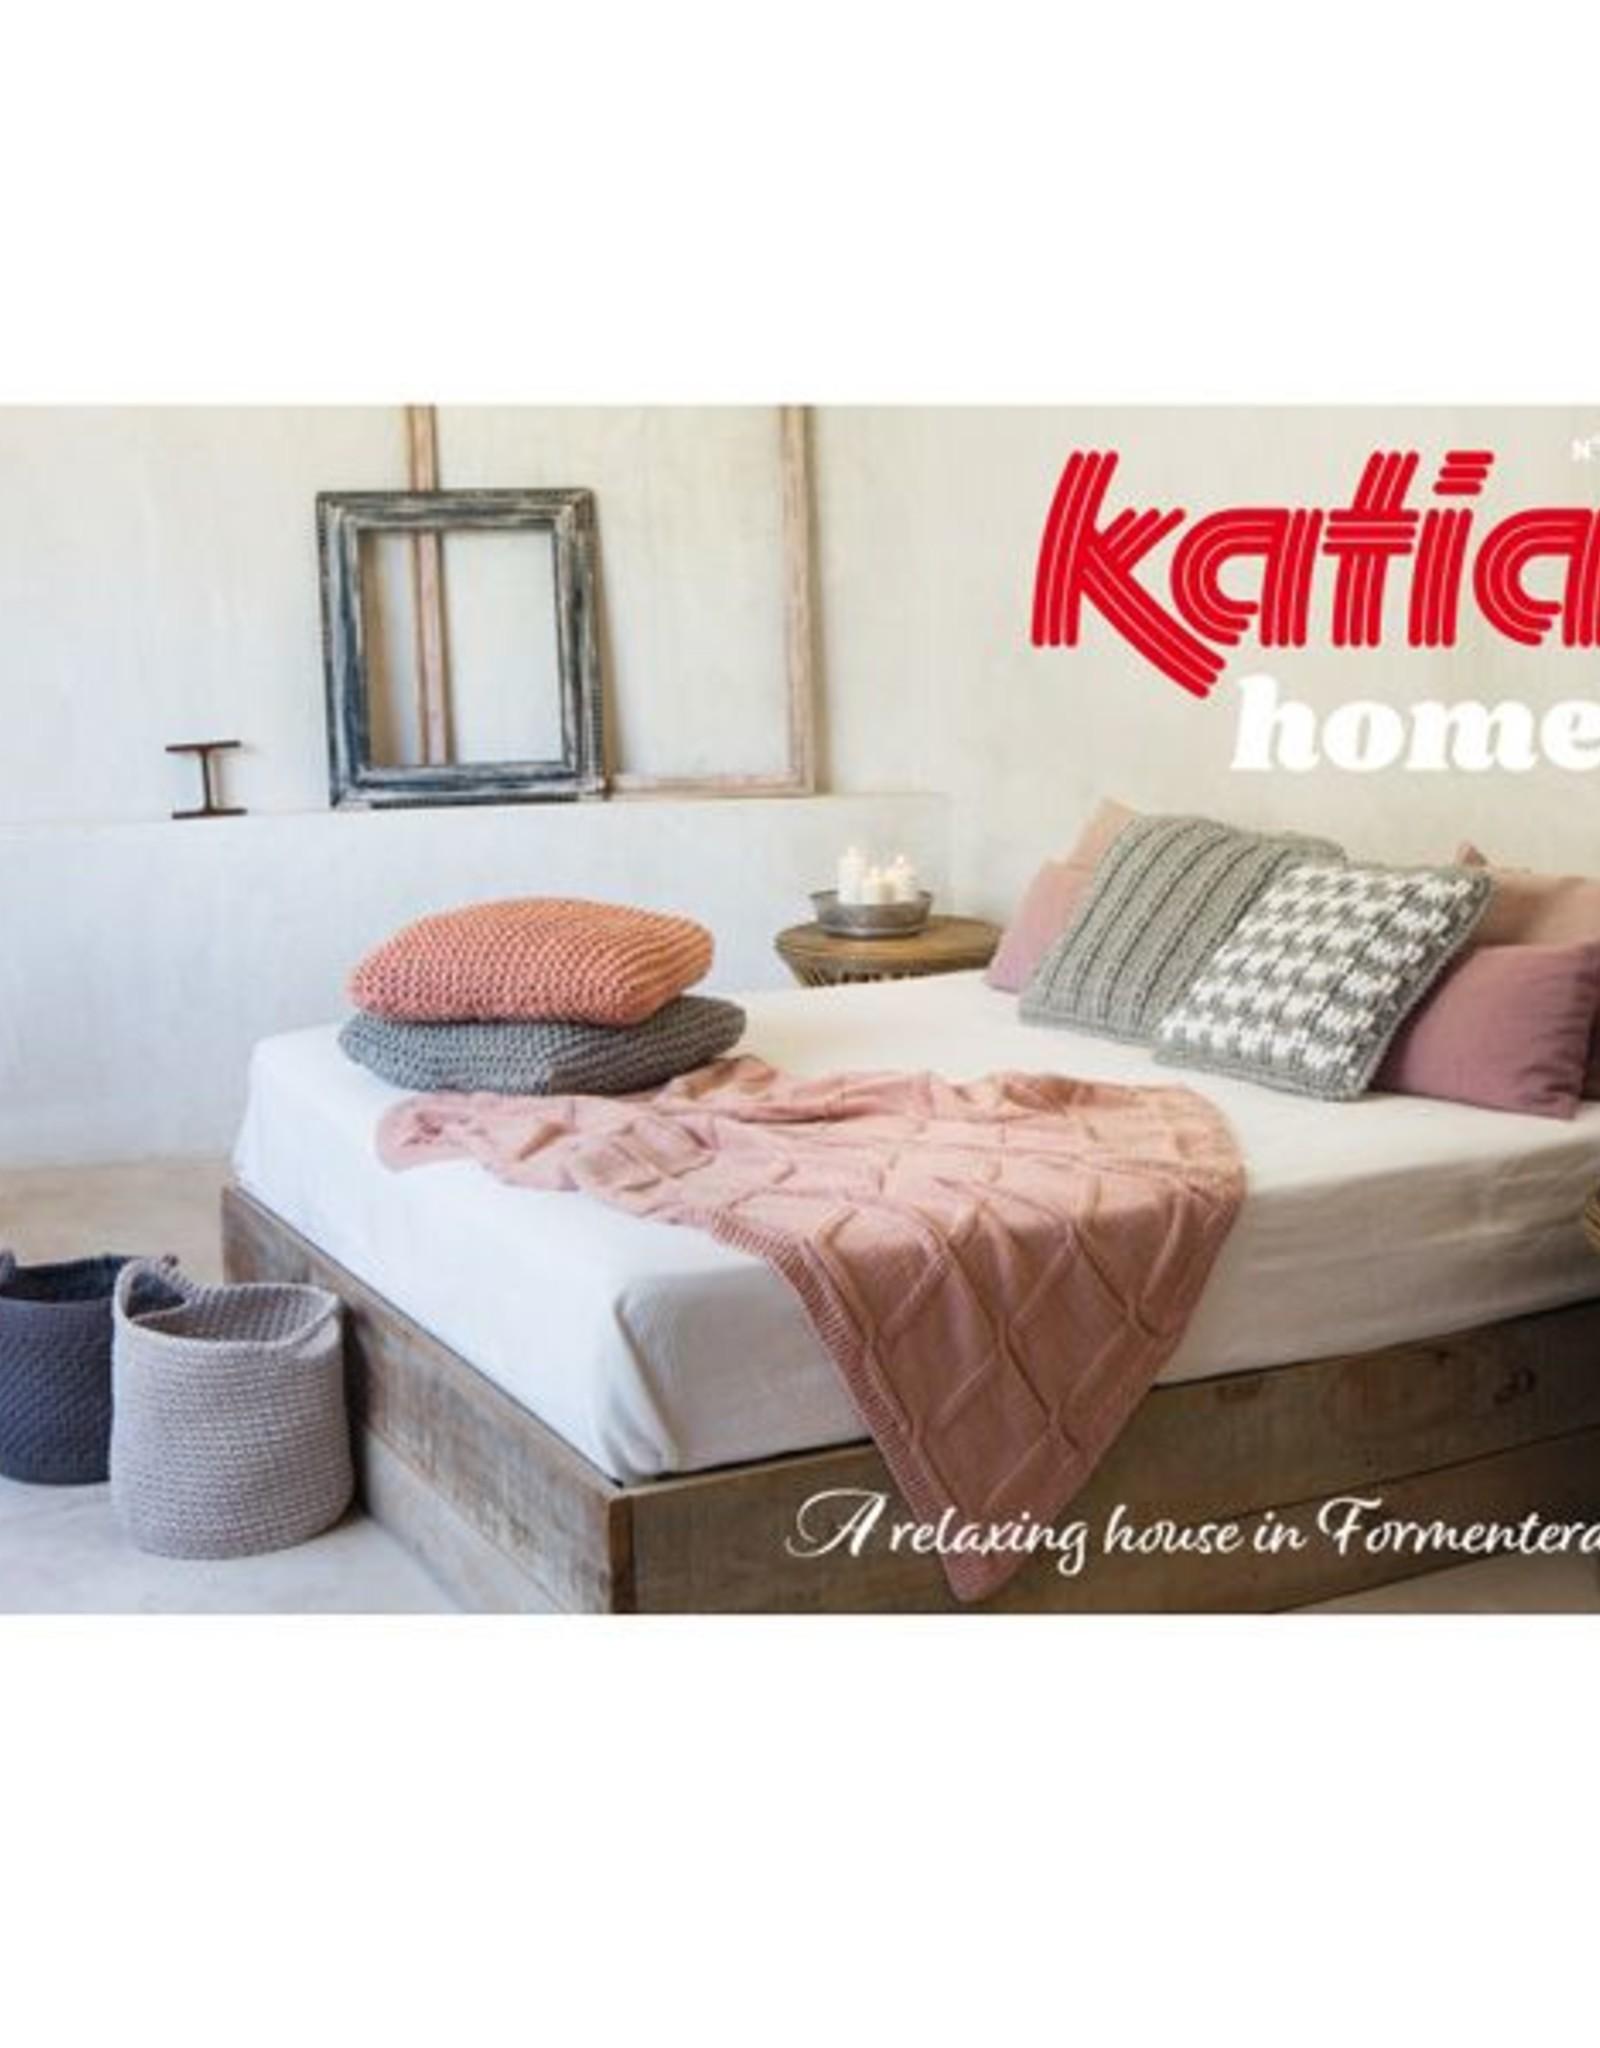 Katia Patronenboek Home 3